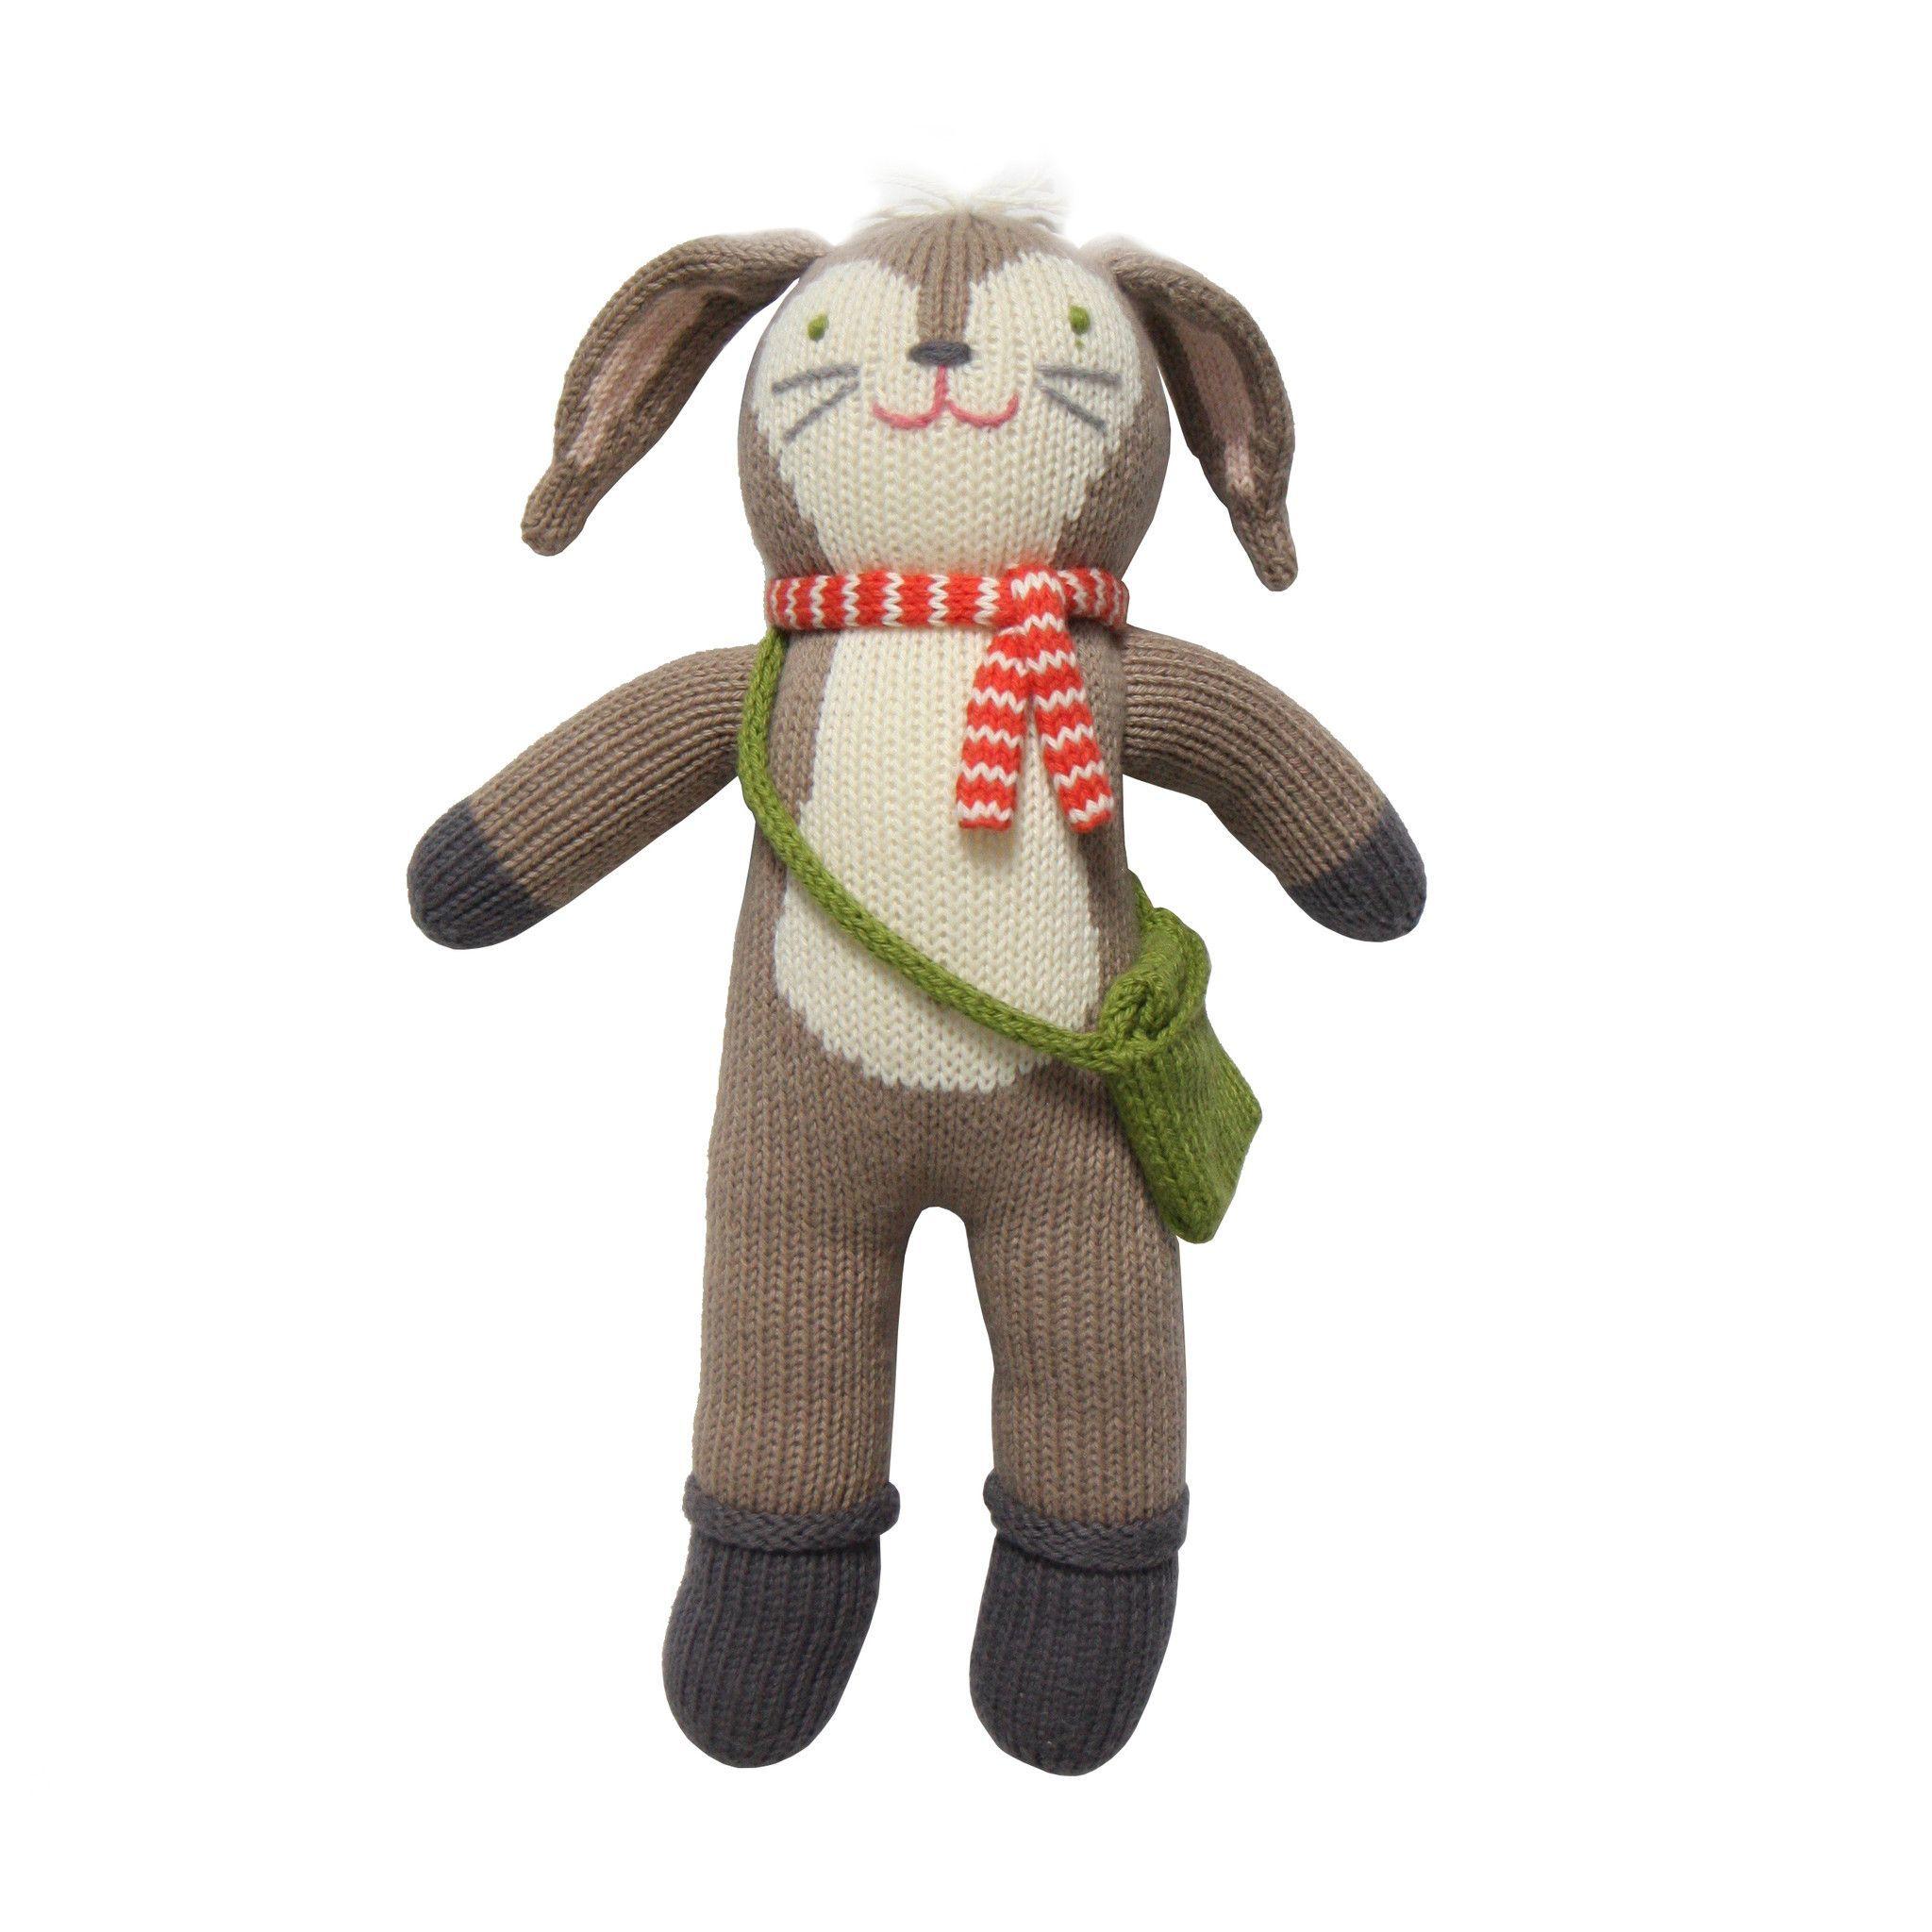 Blabla Doll - Pierre the Bunny